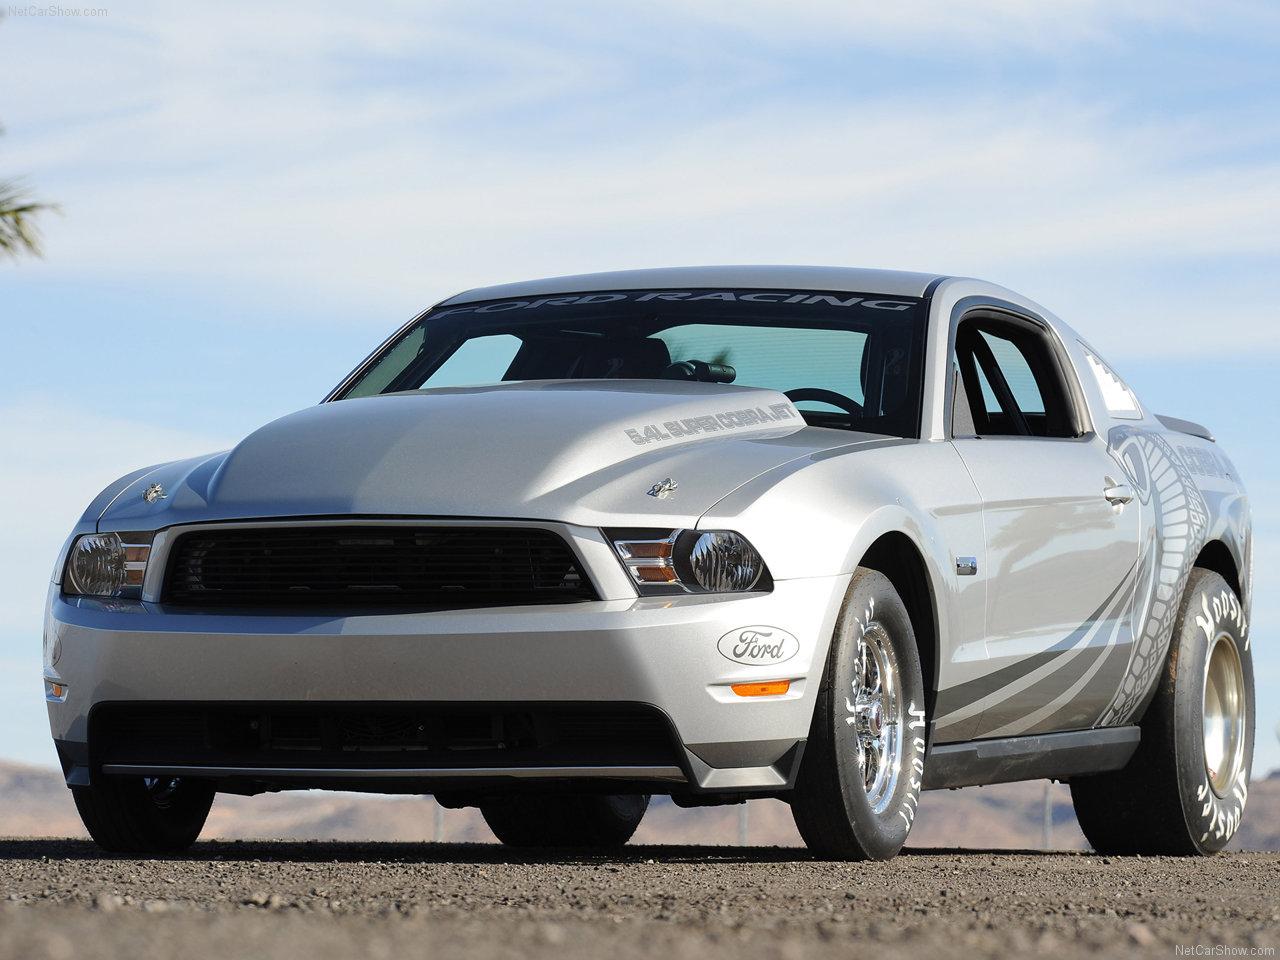 http://1.bp.blogspot.com/_eNKt9scw9RE/TAOcKKmjKzI/AAAAAAAAAGg/l63nEG3i-m4/s1600/2010+Ford+Mustang+Cobra+Jet+auto+gallery.jpg